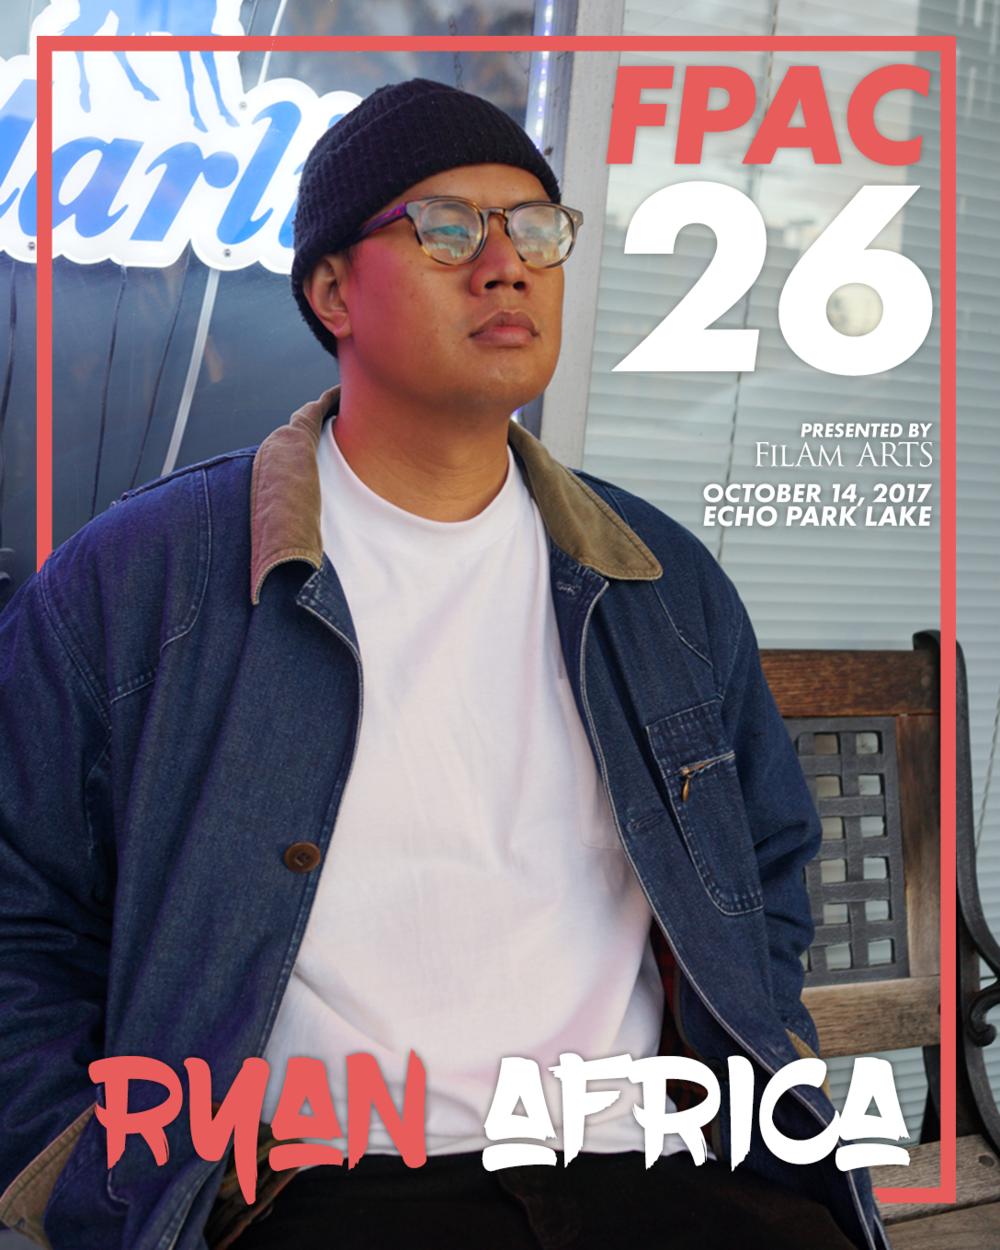 Ryan Africa